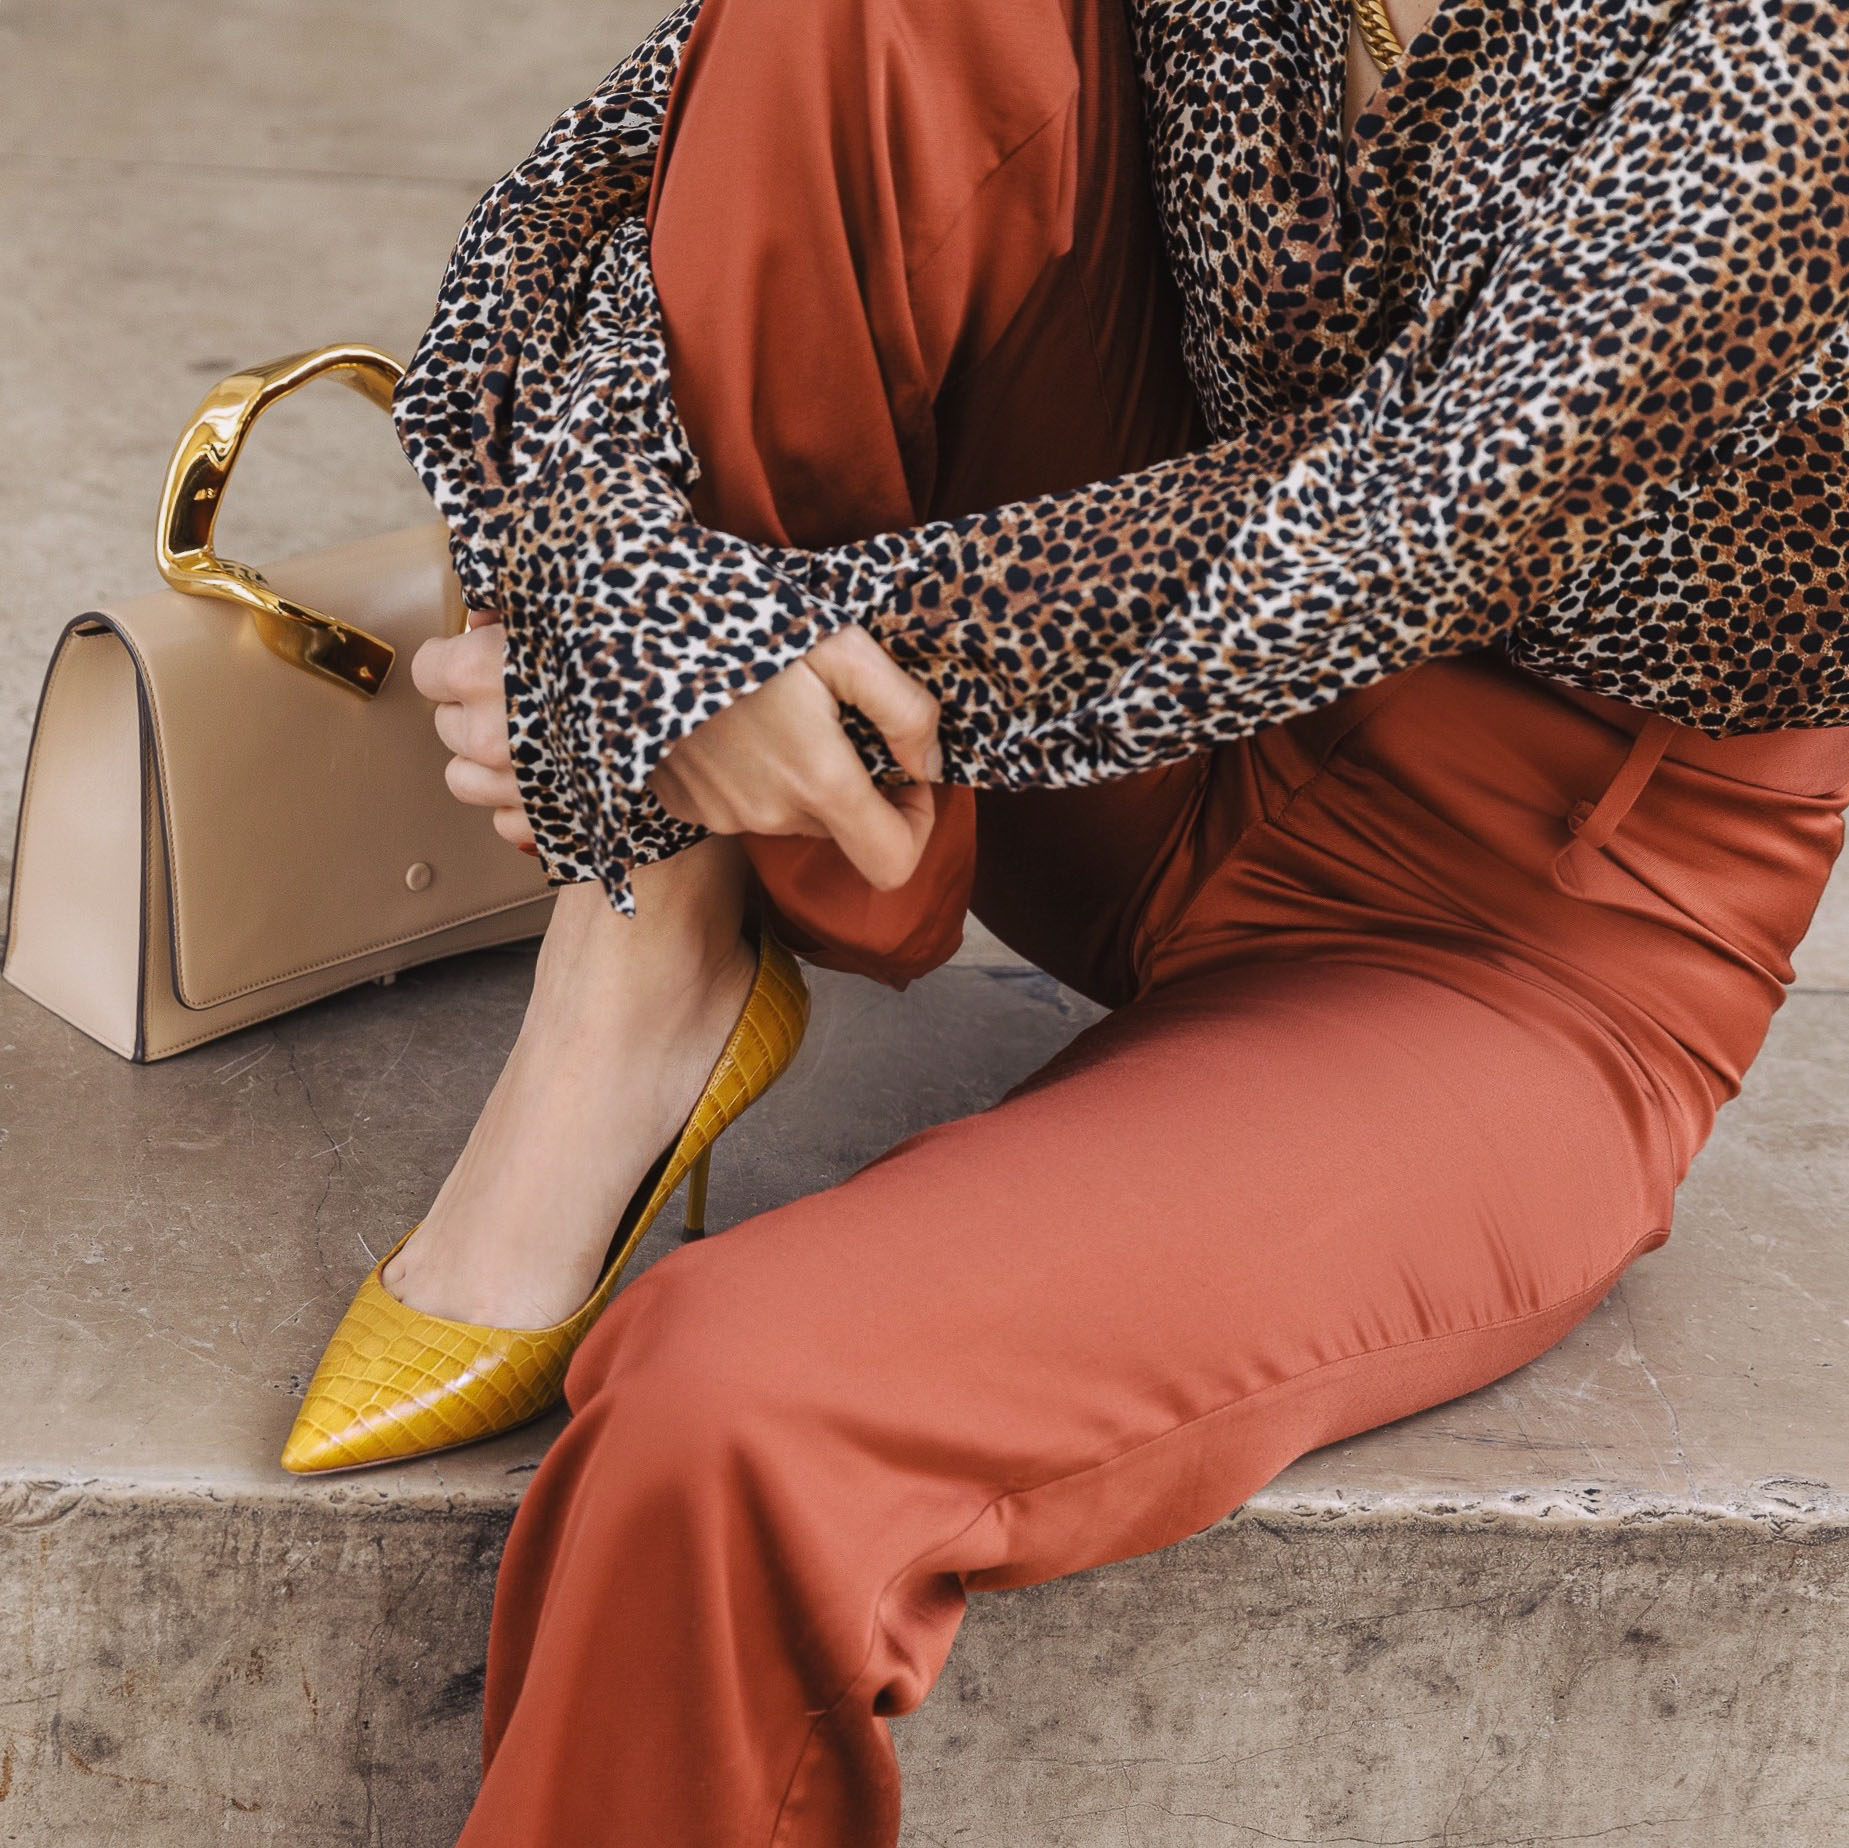 PFW SS20 Street Style Fall 2019 Paris Fashion Week Julia Comil wearing Madiyahalsharqi pants, bag L Etrange Paris, pumps Monnier Freres x Aquazurra, blouse Equipment